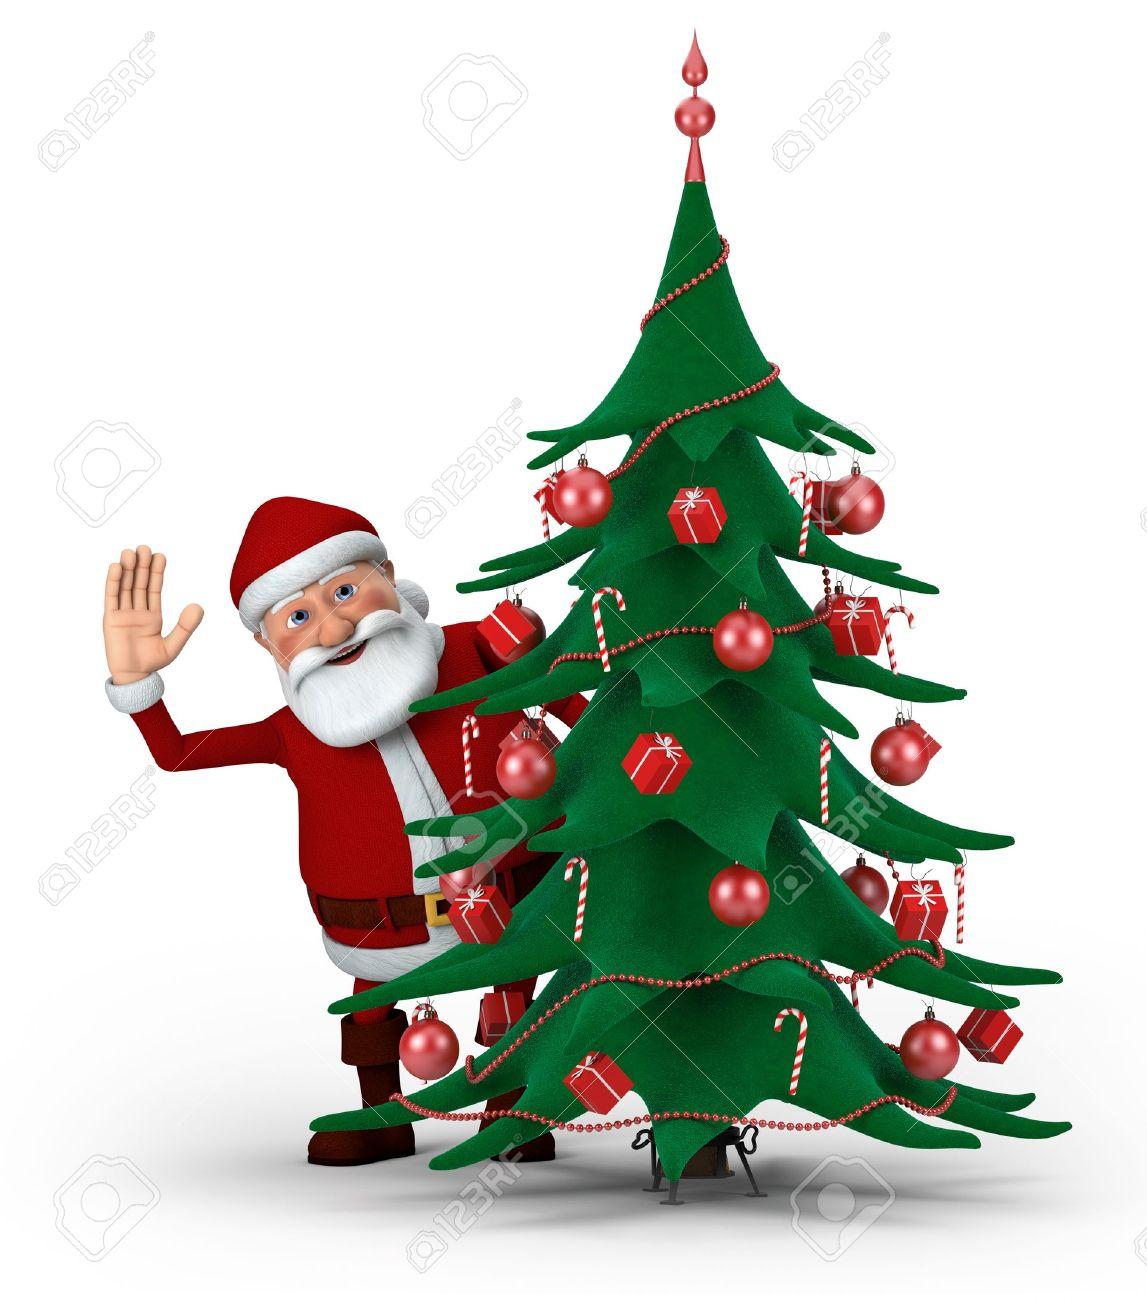 cartoon santa claus waving from behind christmas tree high quality 3d illustration stockfoto 11299197 - Santa Claus Tree